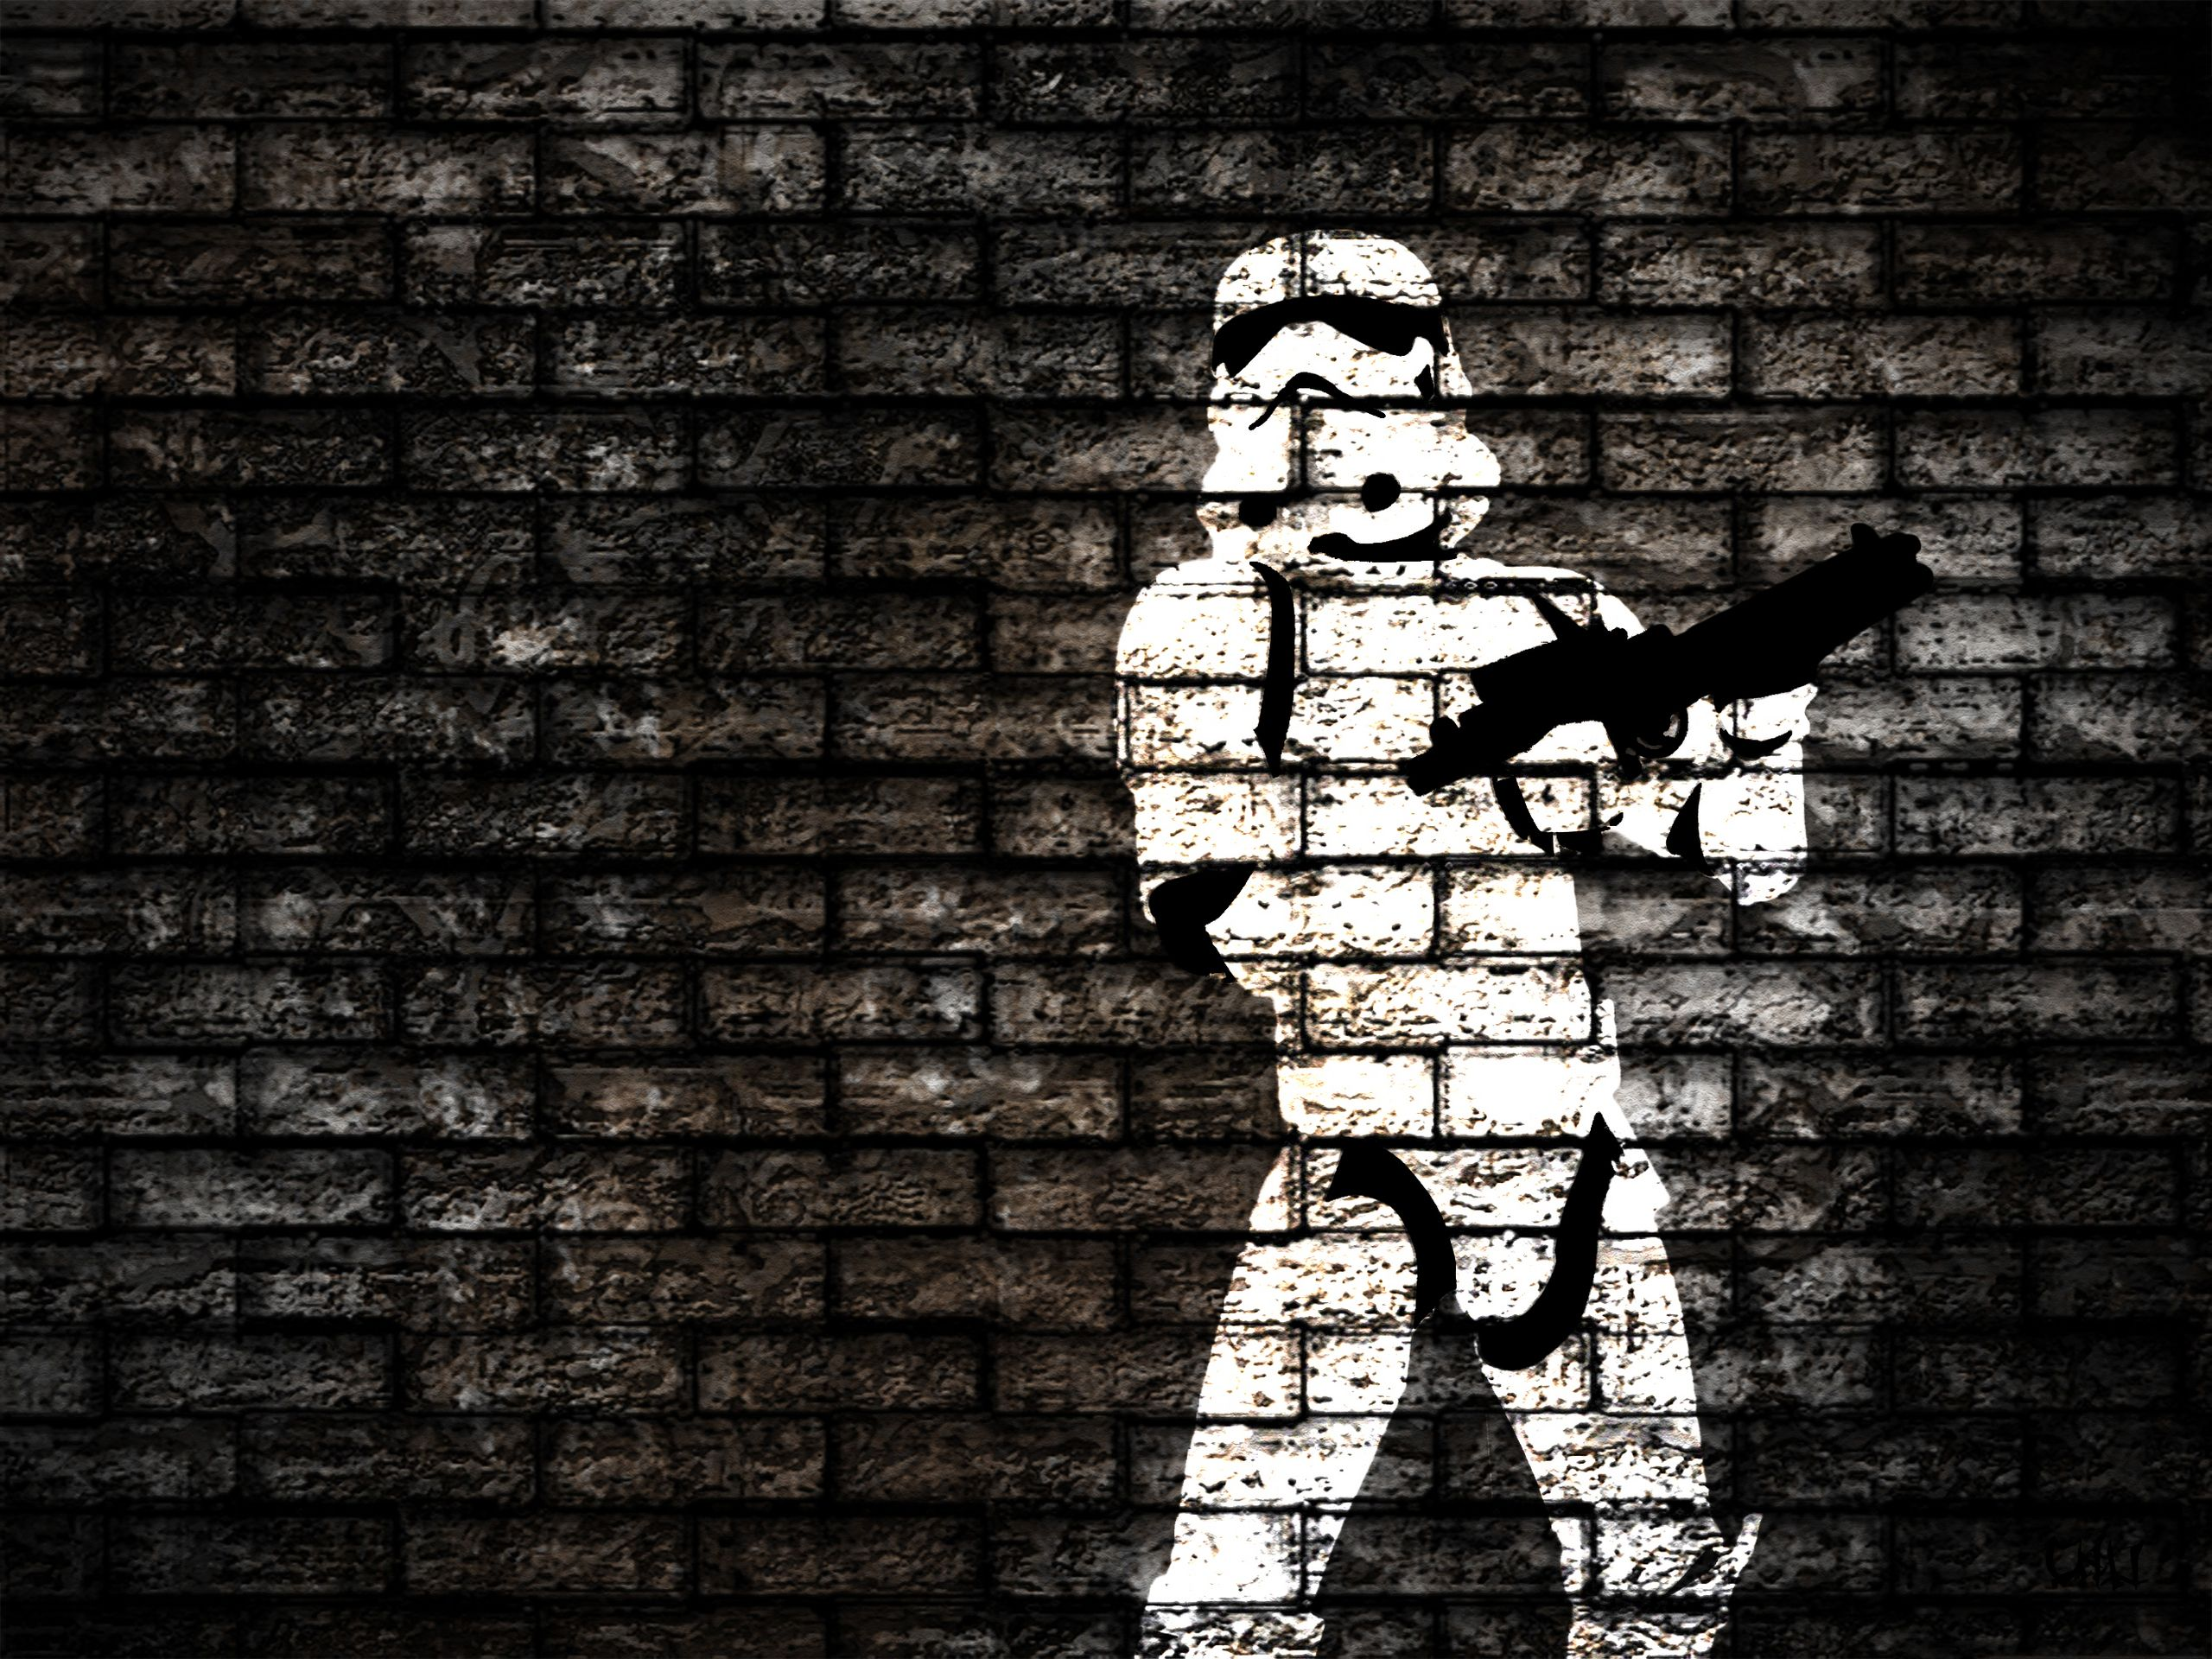 Stormtrooper-Wallpaper-star-wars-26662735-2560-1920.jpg 2,560 ...